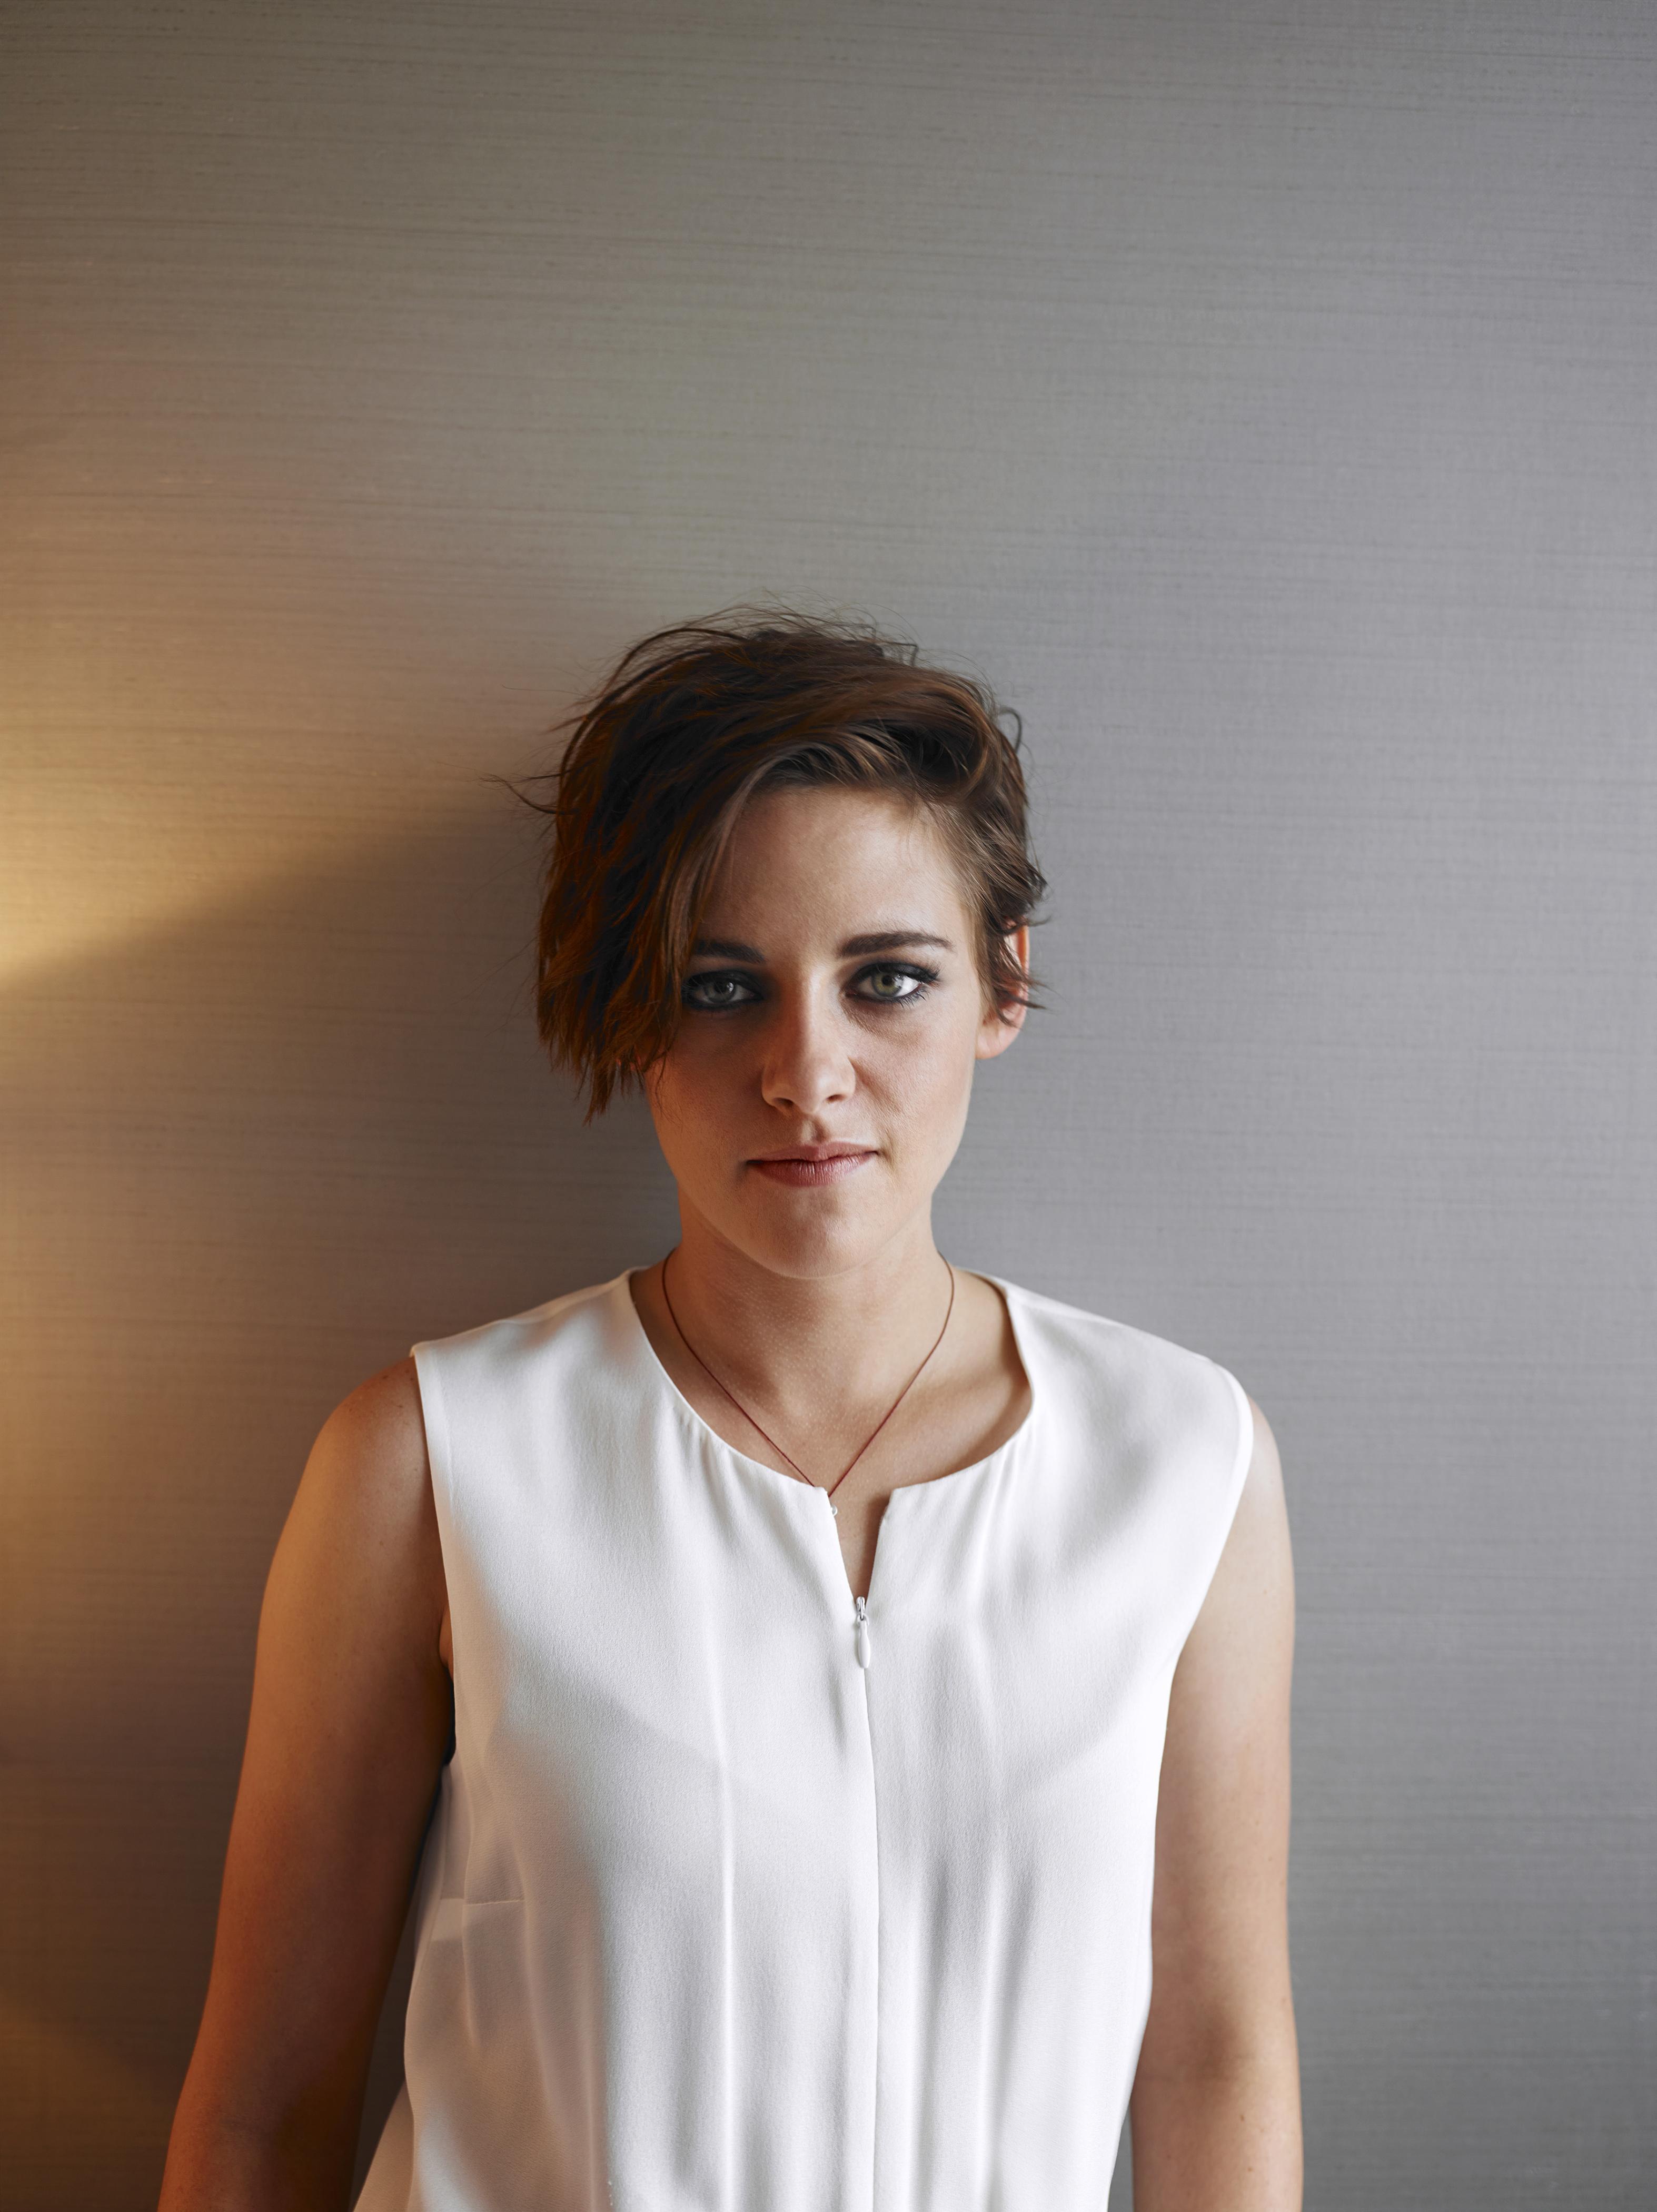 Kristen Stewart pictures gallery (46) | Film Actresses